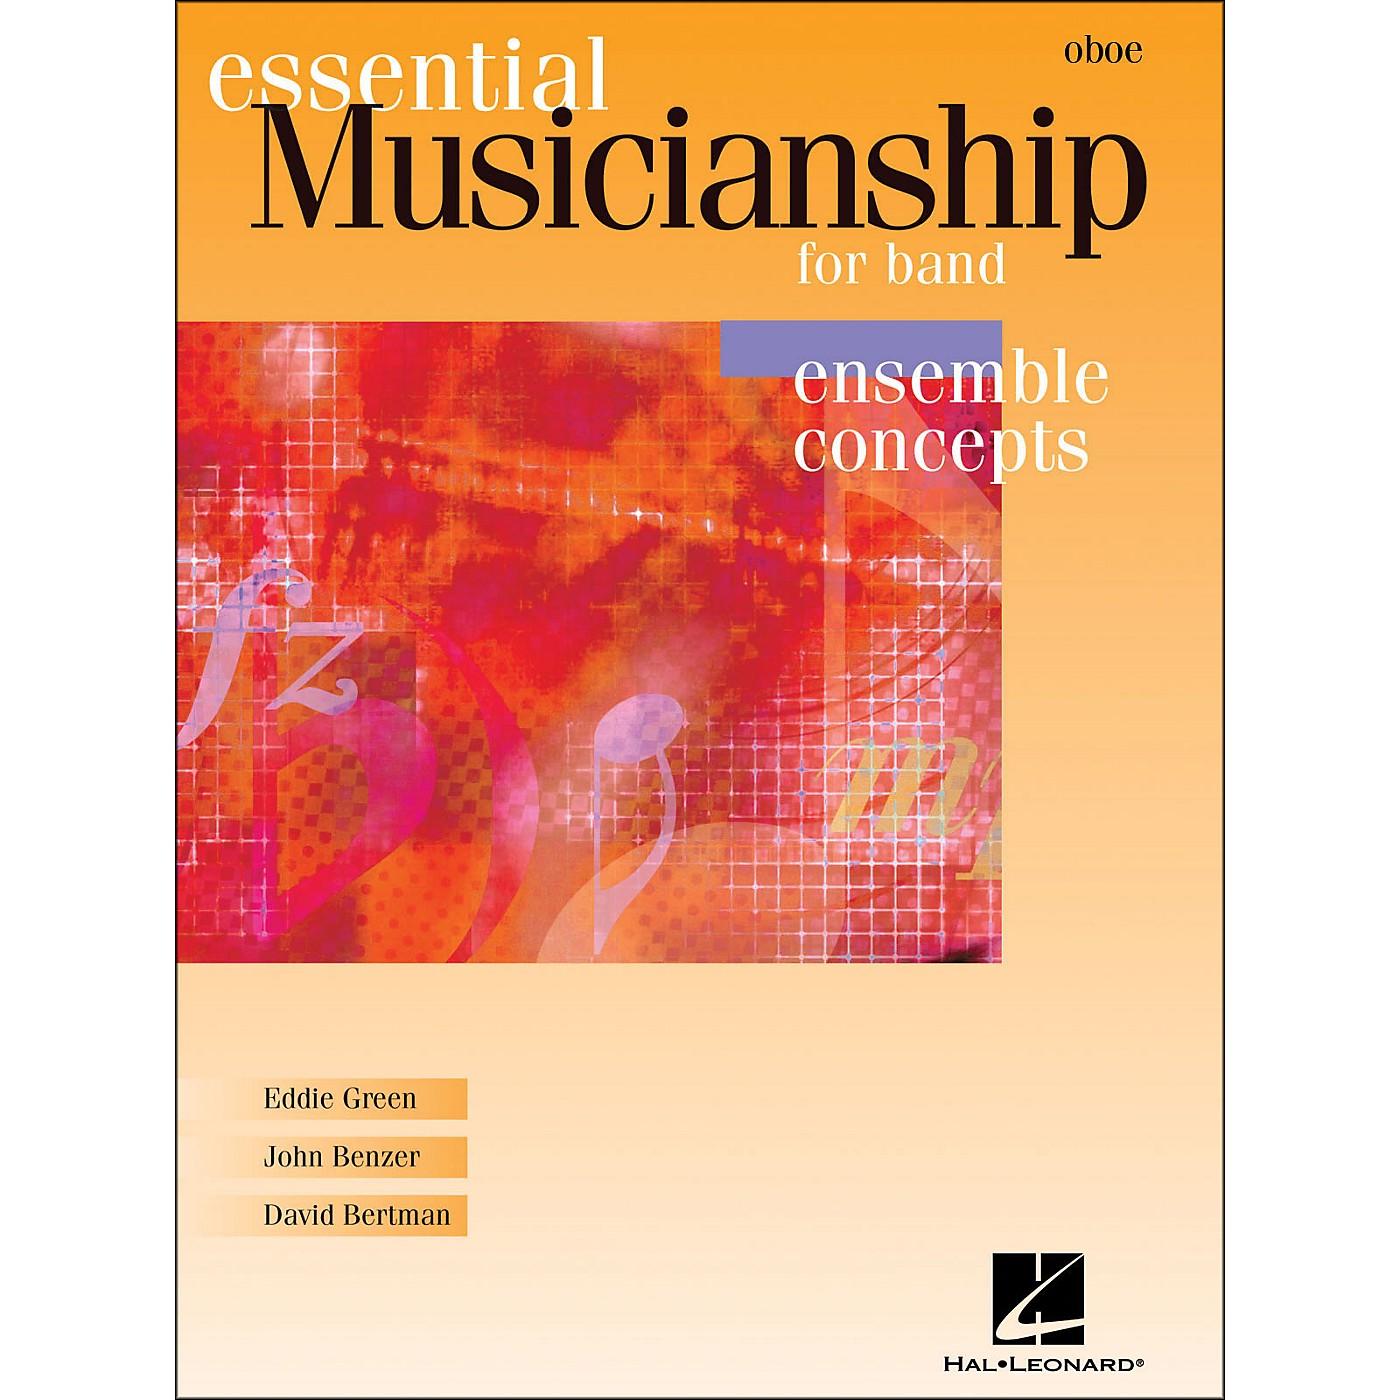 Hal Leonard Essential Musicianship for Band - Ensemble Concepts Oboe thumbnail